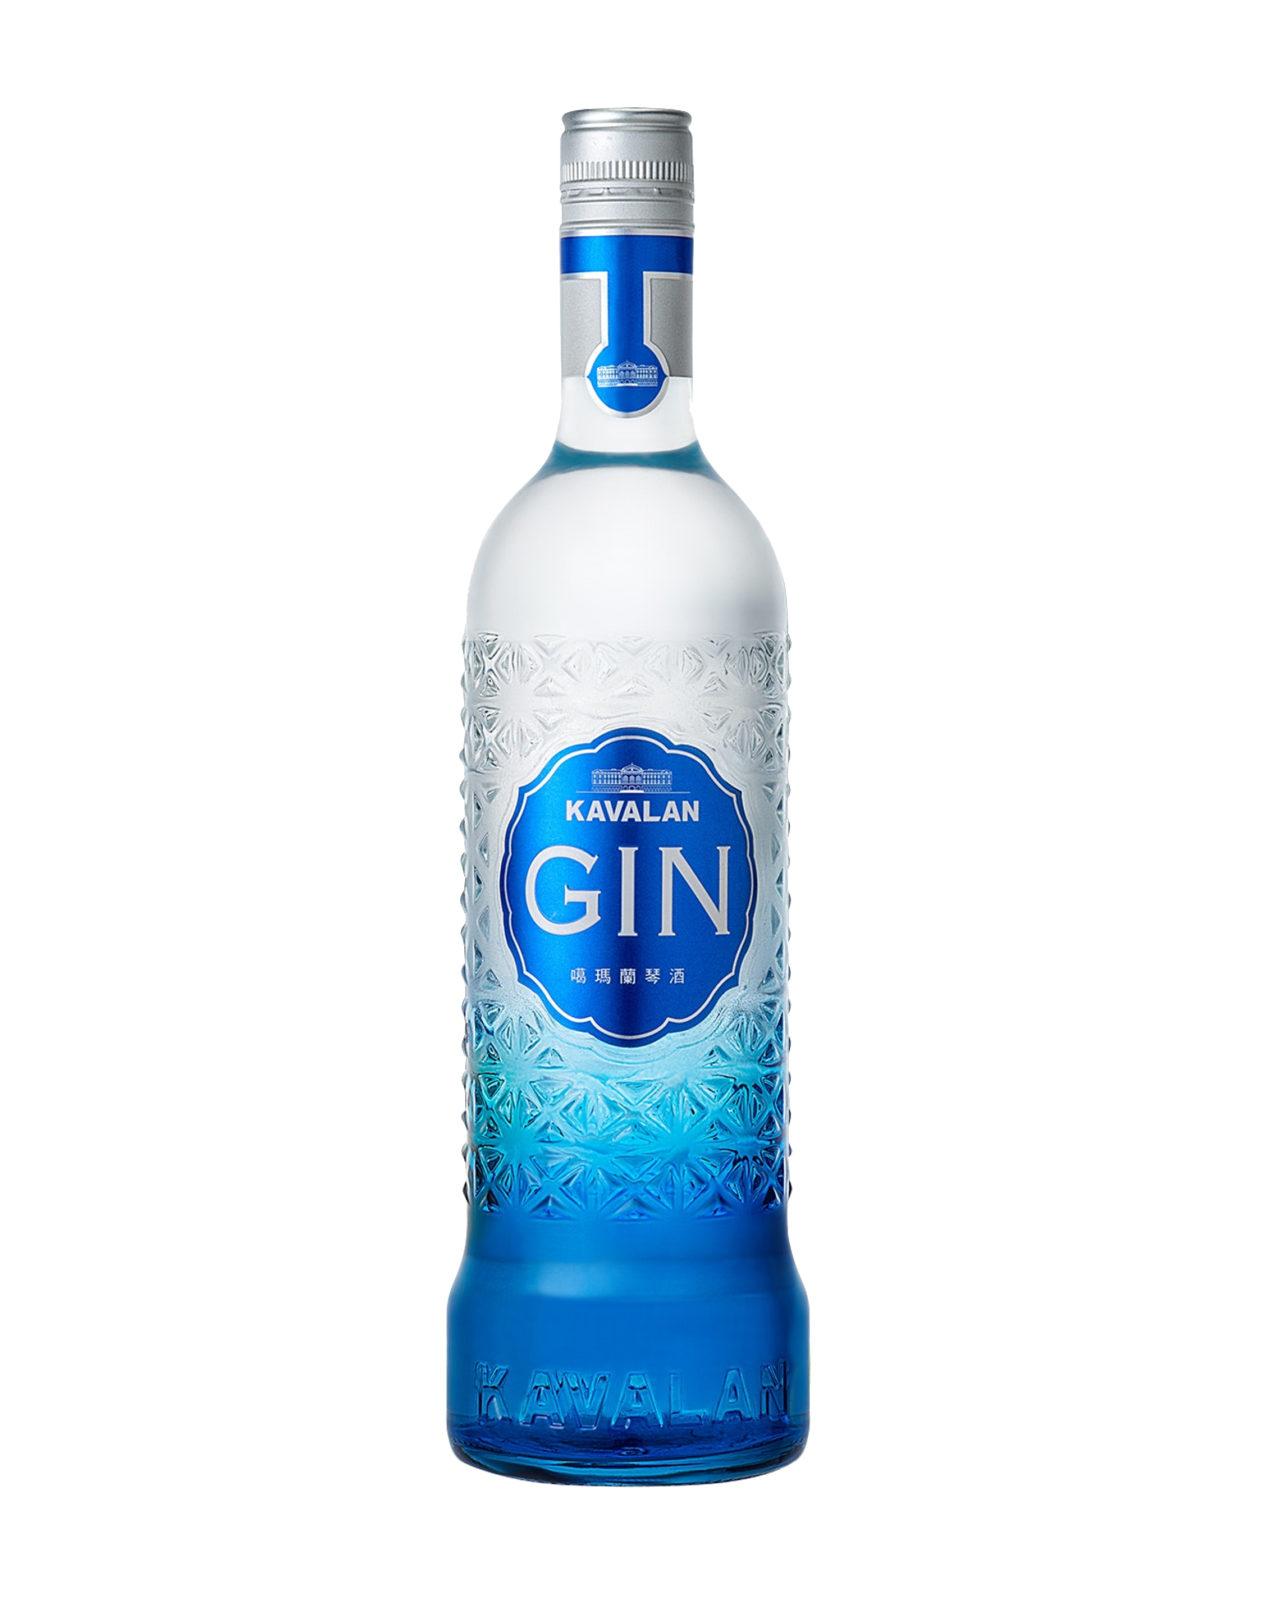 Kavalan Gin Taiwan New Release